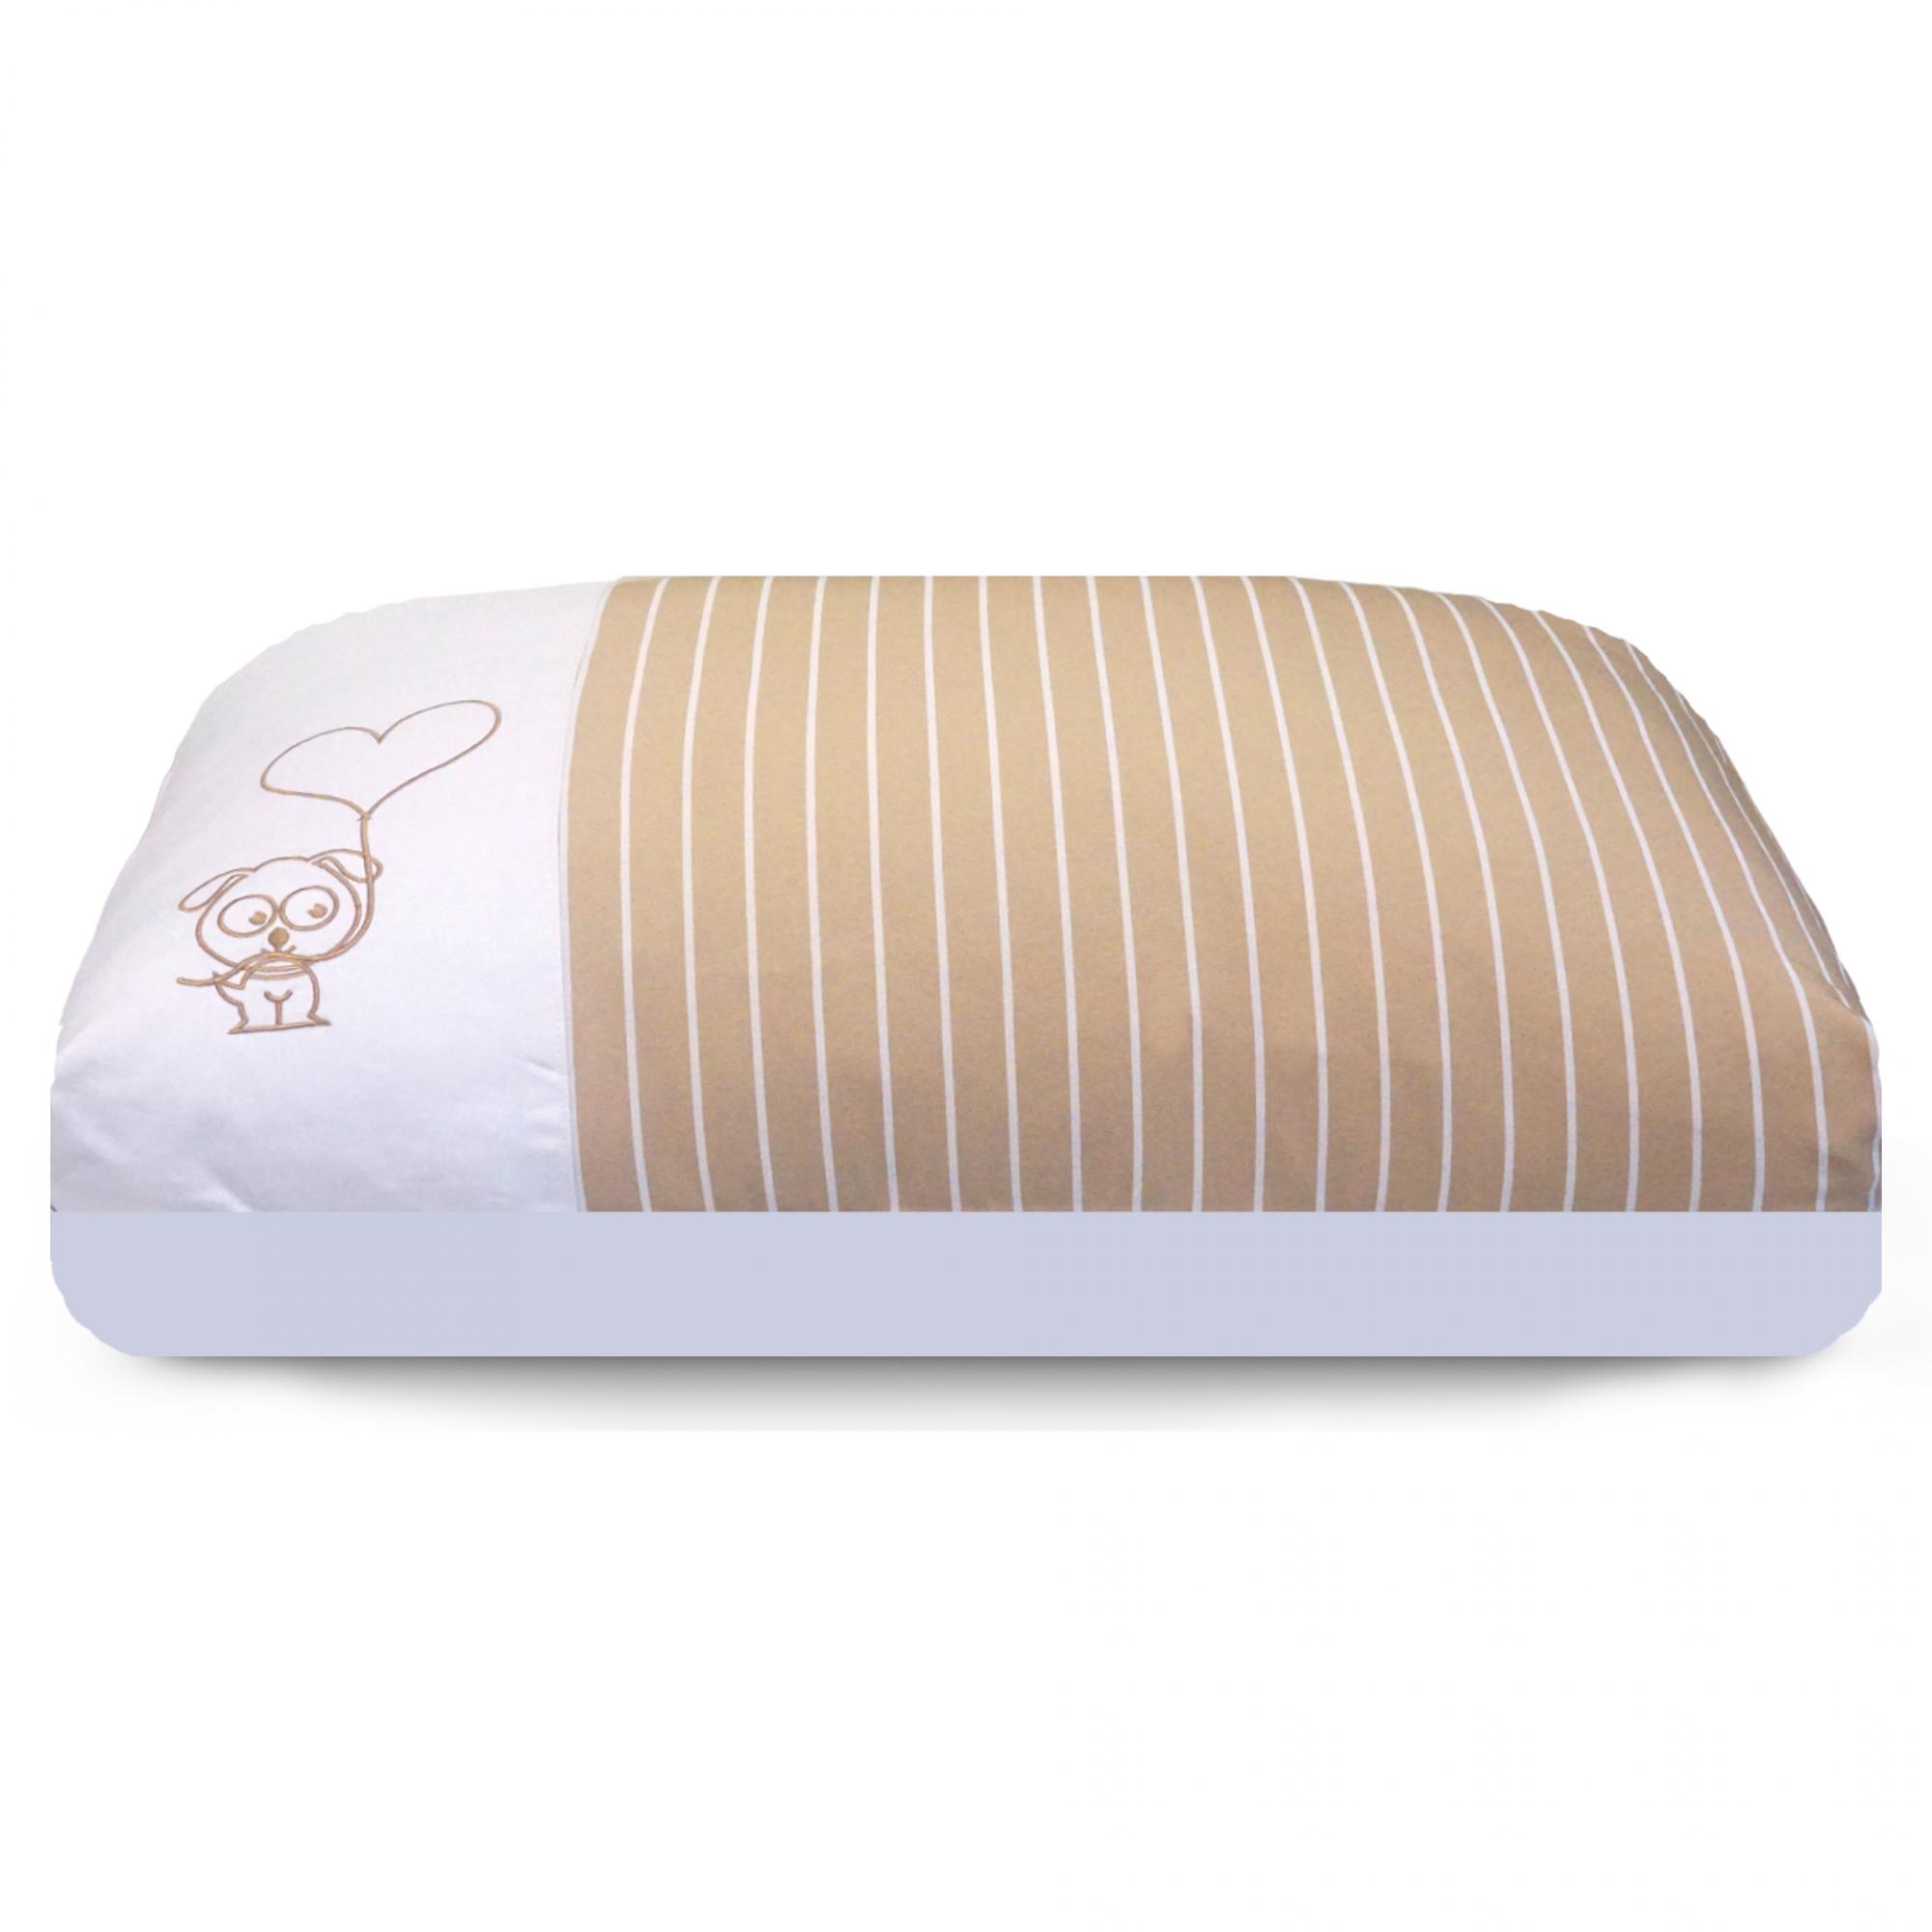 Dreamcastle Dog Bed - Ashley the Dreamer